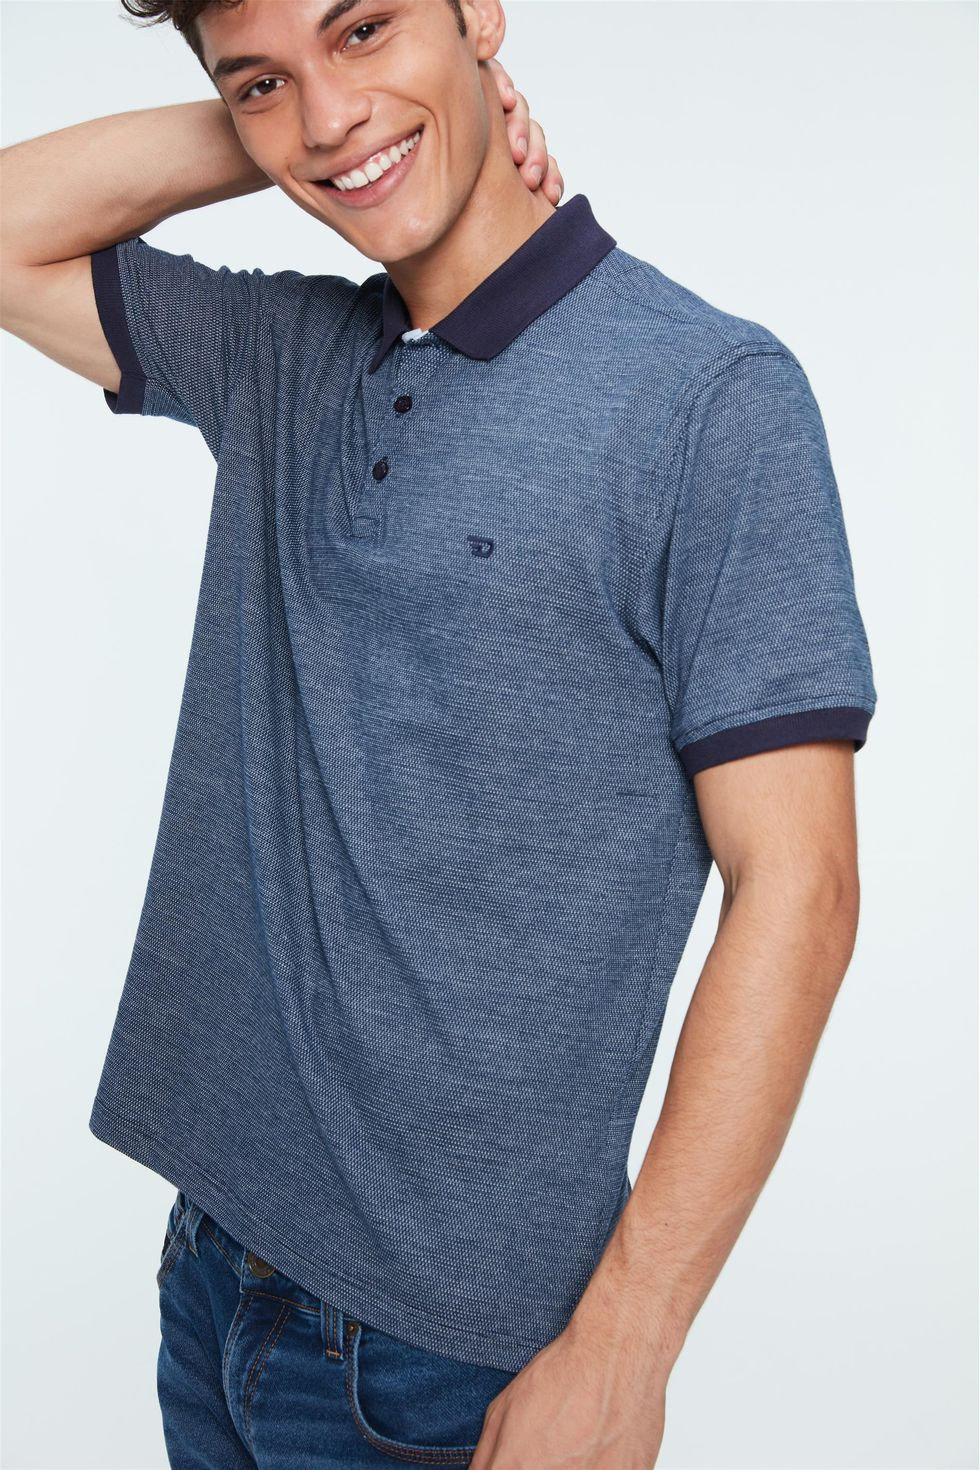 Camisa-Polo-Fit-Masculina-Frente--